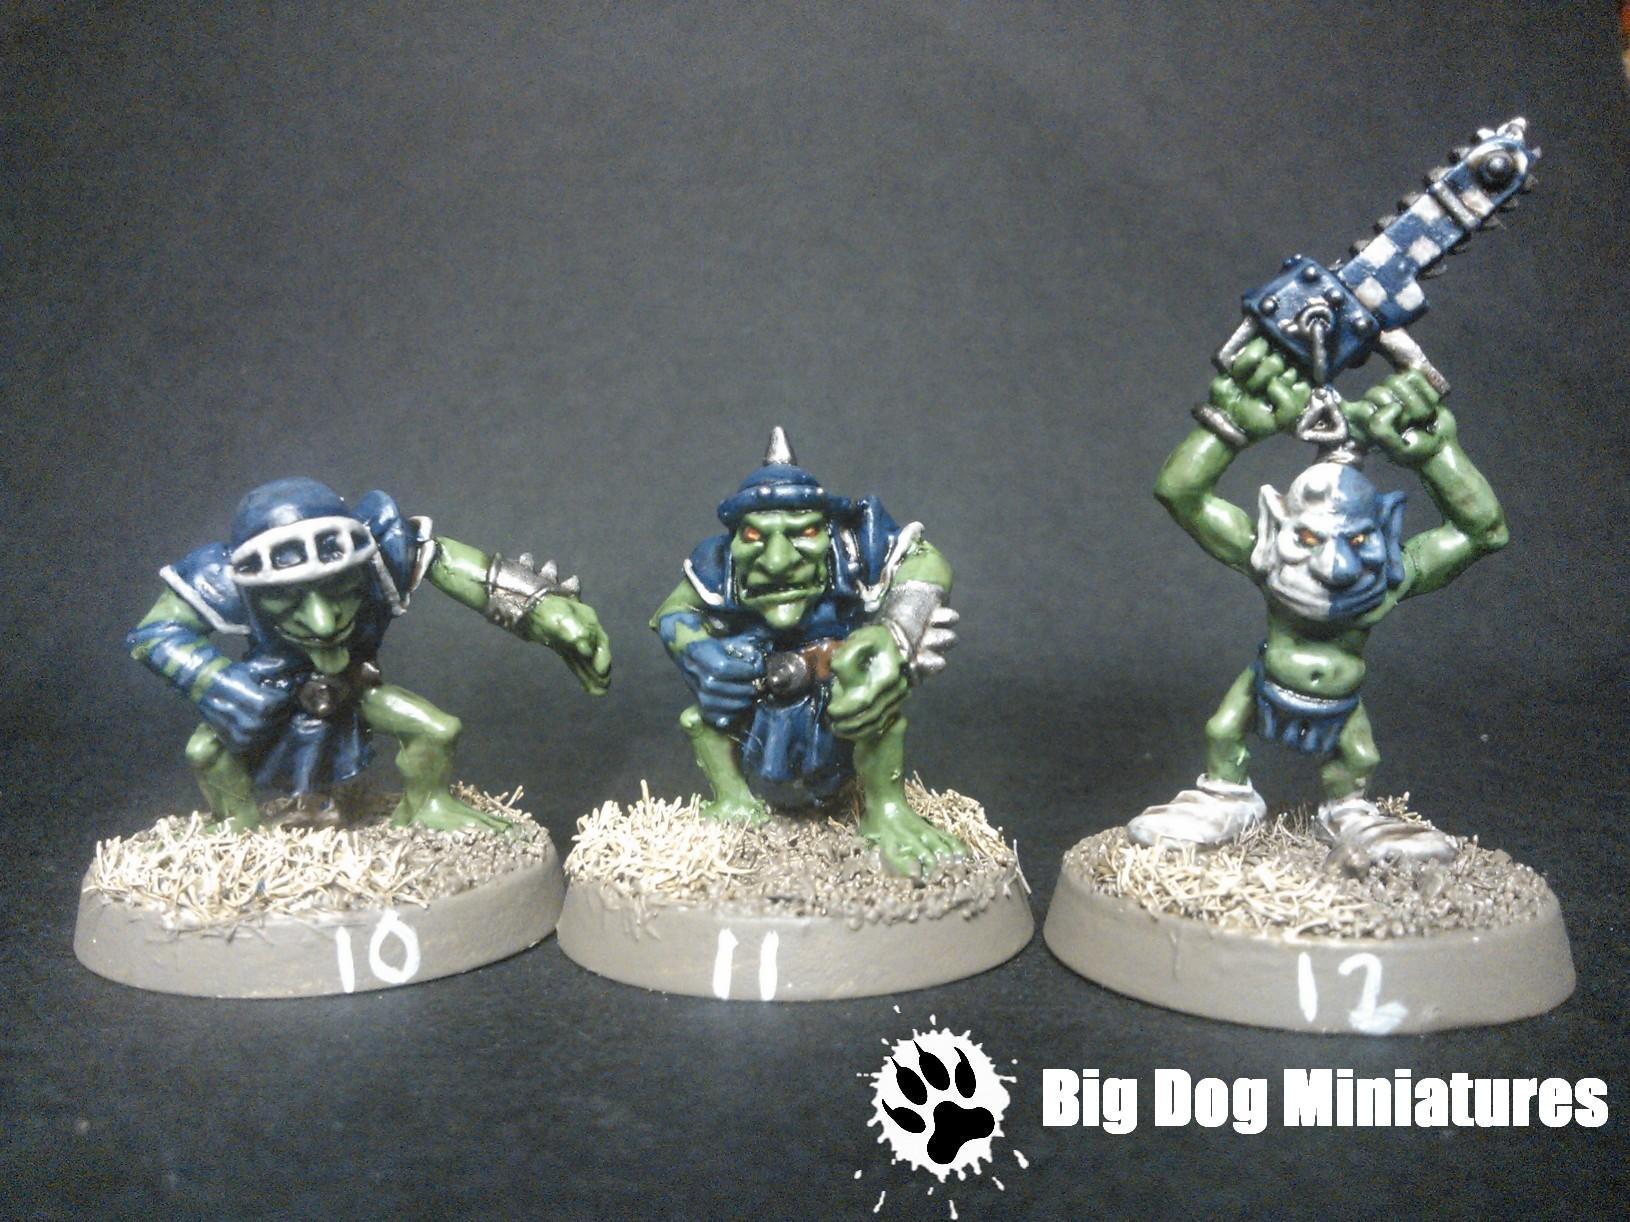 Big Dog Miniatures, Blood, Bowl, Chainsaw, Cheerleader, Goblins, Troll